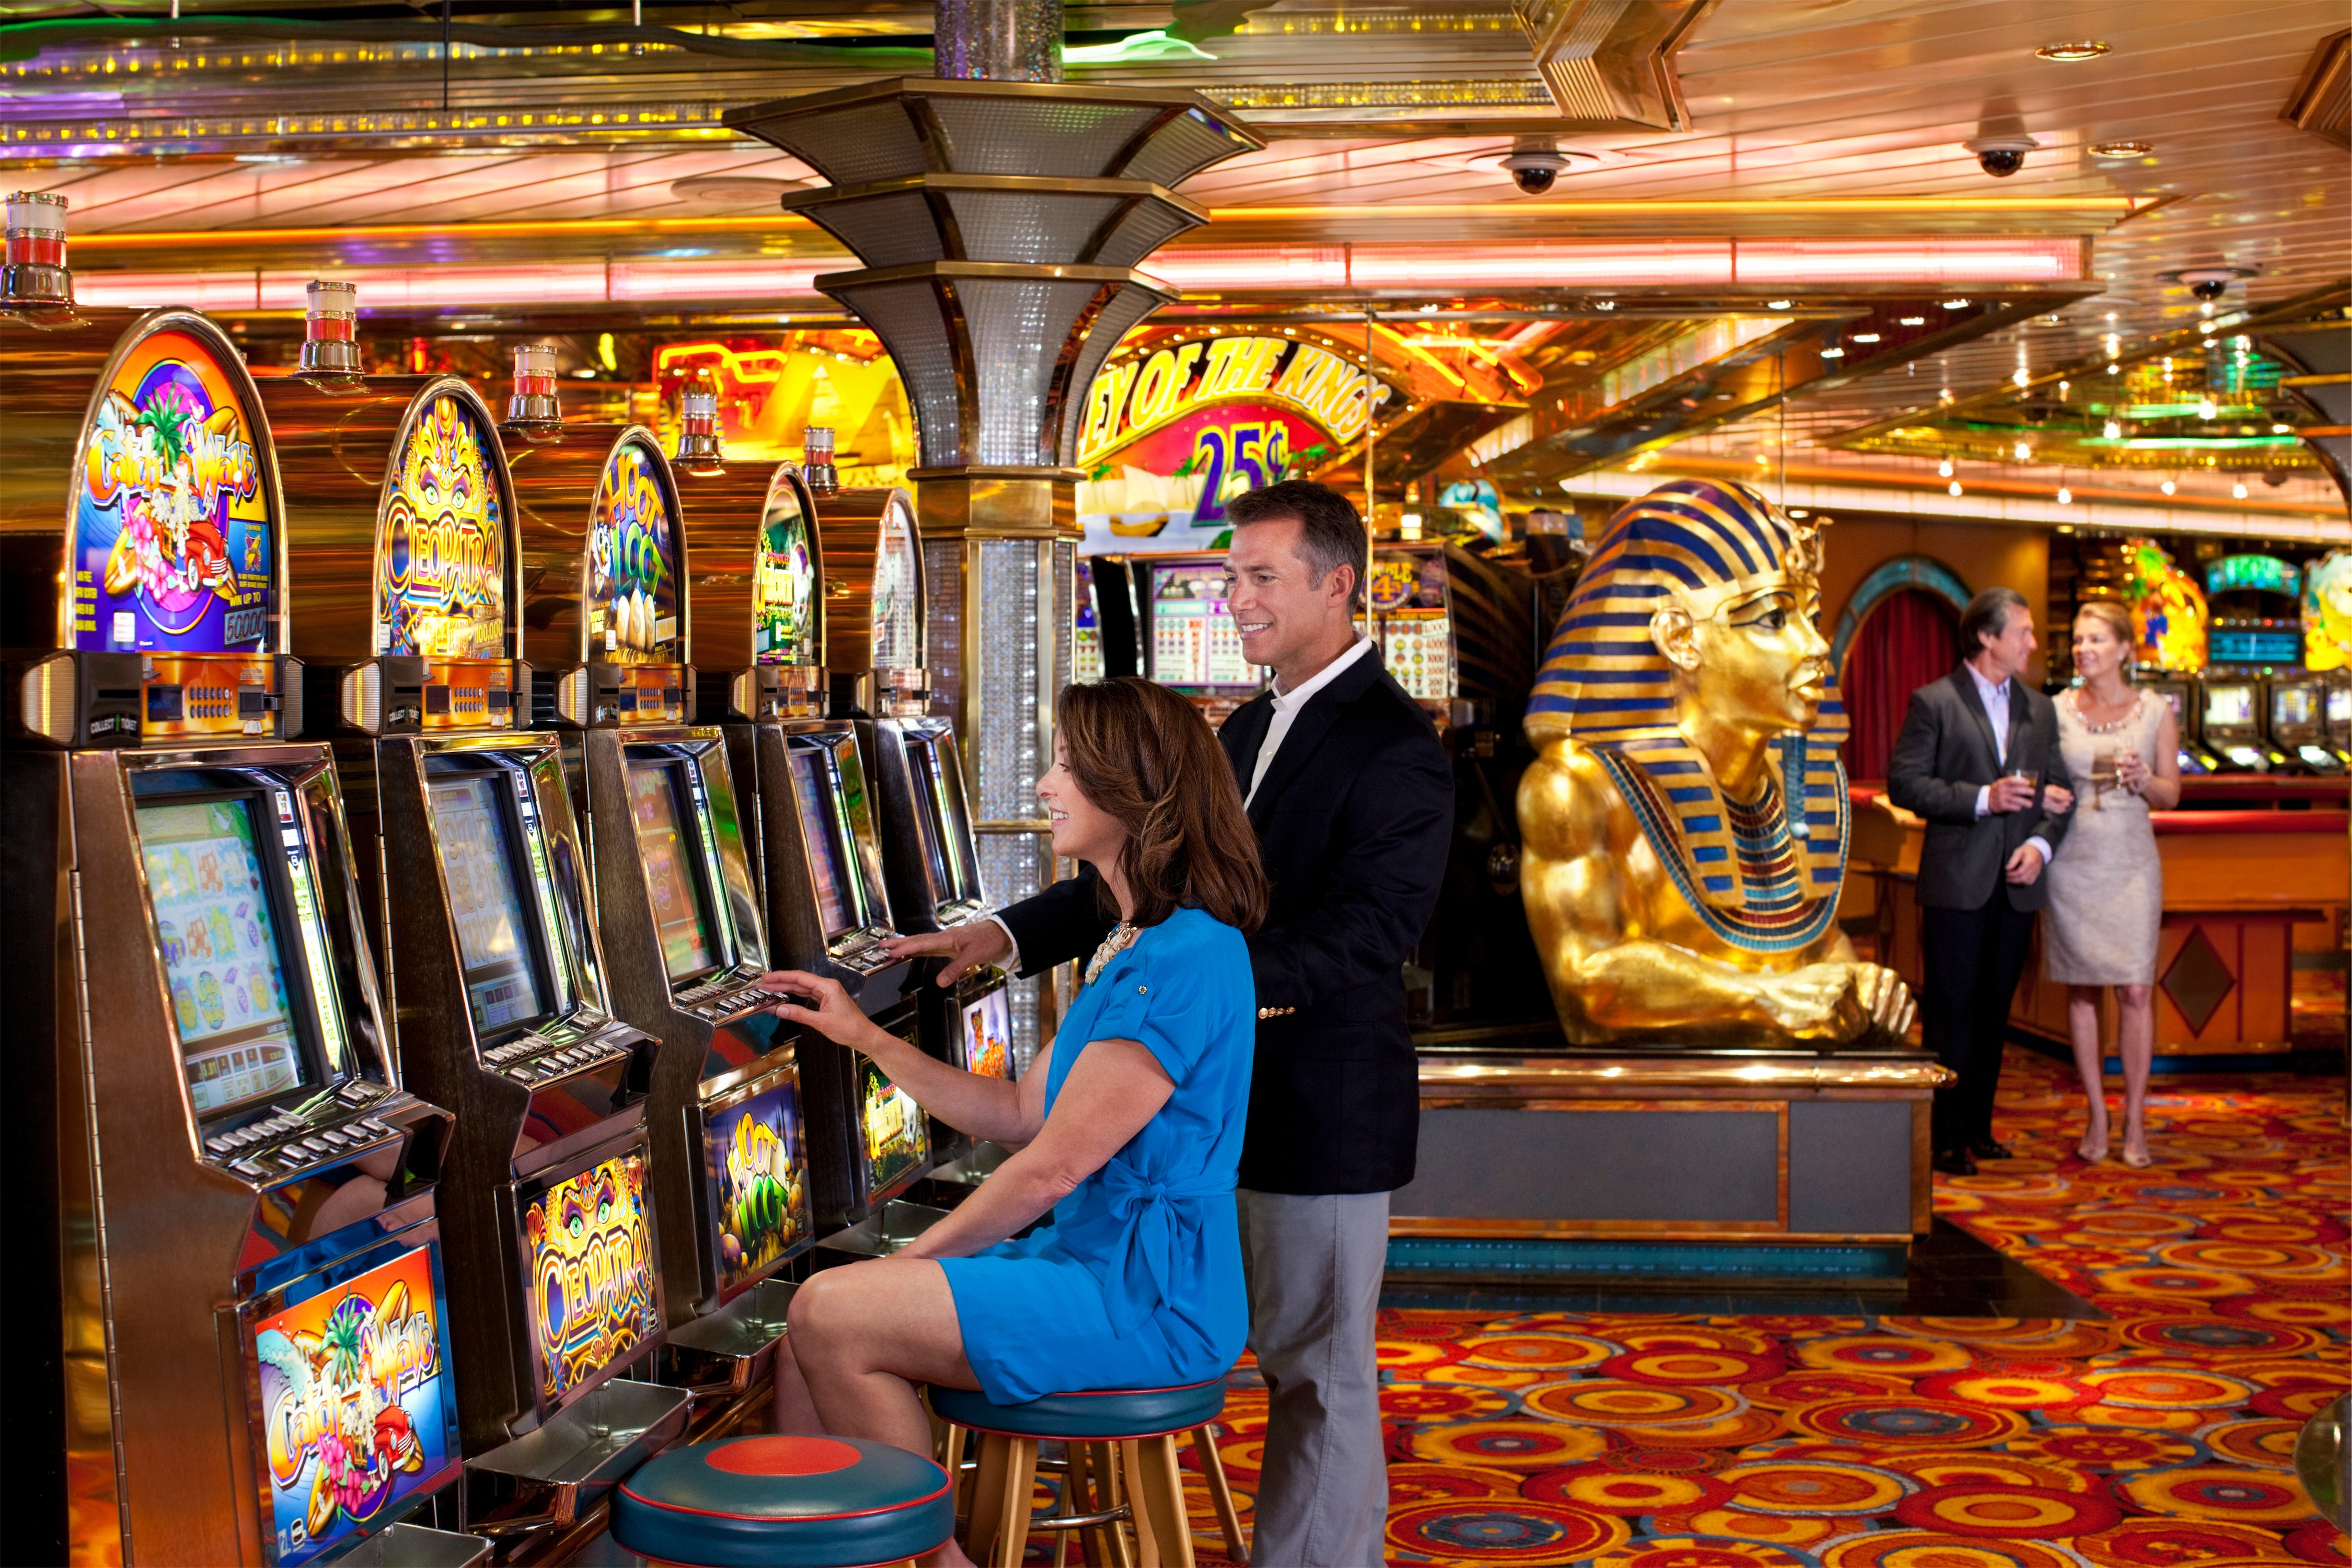 Royal Caribbean International Grandeur of the Seas Interior Casino 032F.jpg